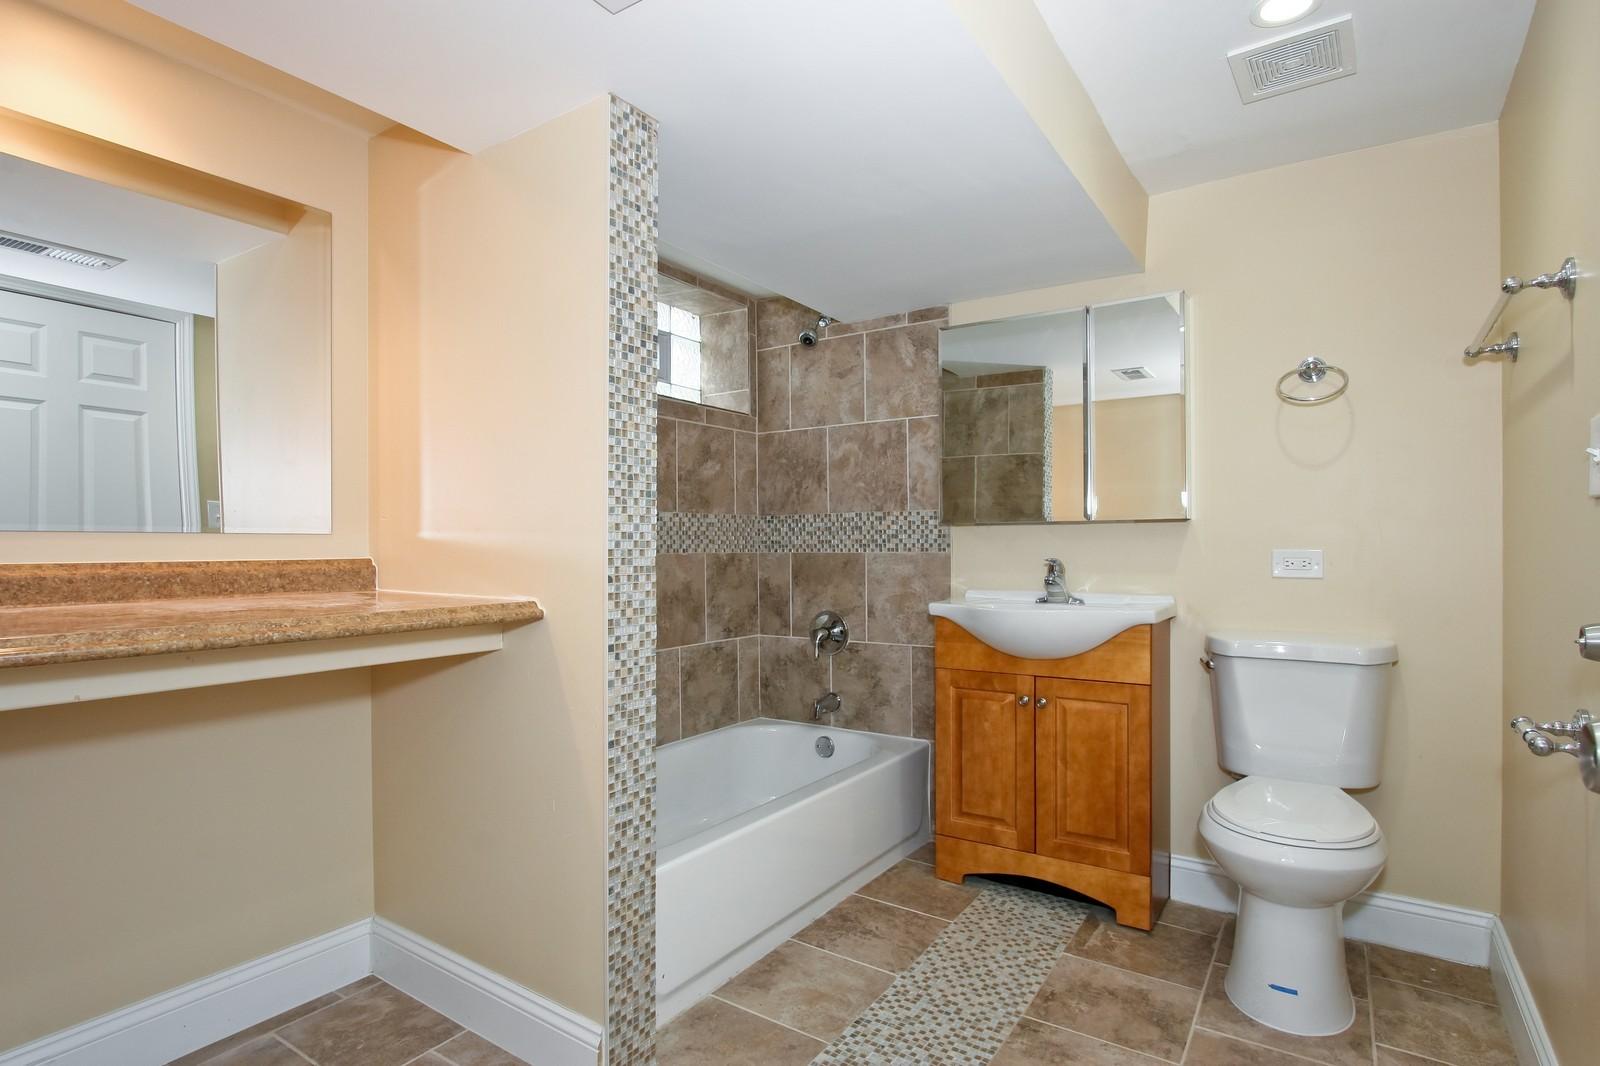 Real Estate Photography - 1025 E 156th St, Dolton, IL, 60419 - Master Bathroom